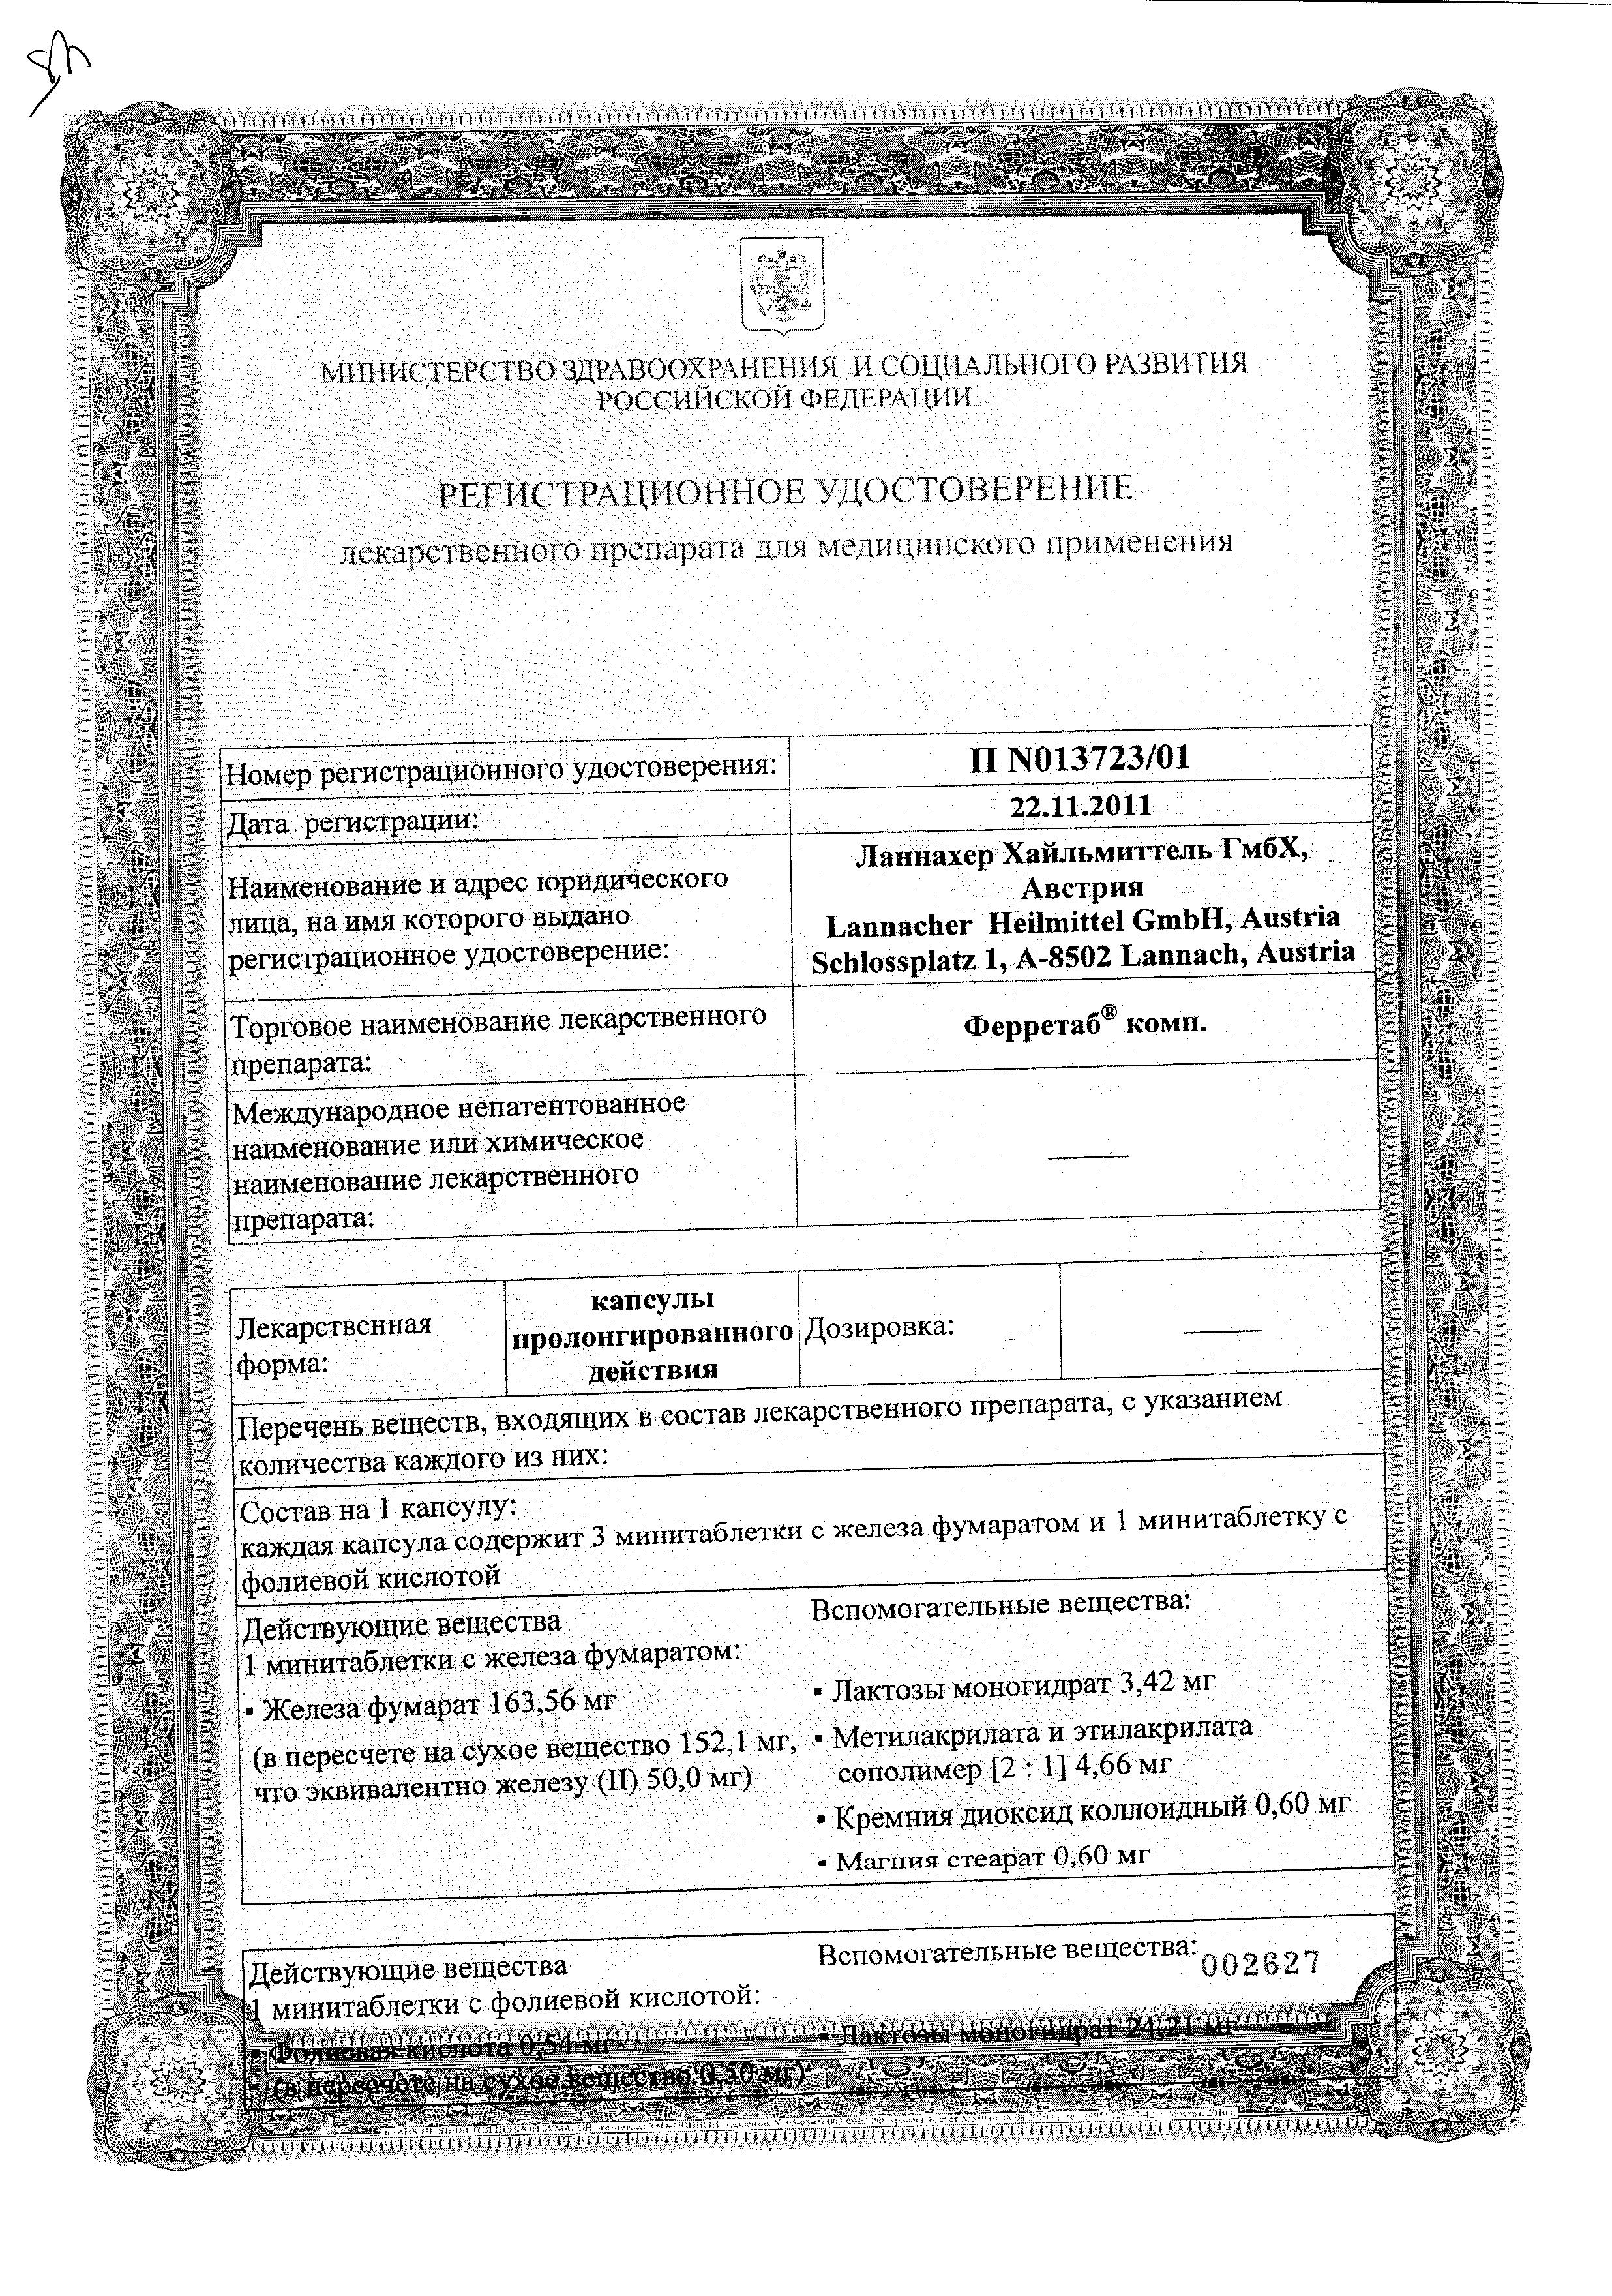 Ферретаб комп. сертификат